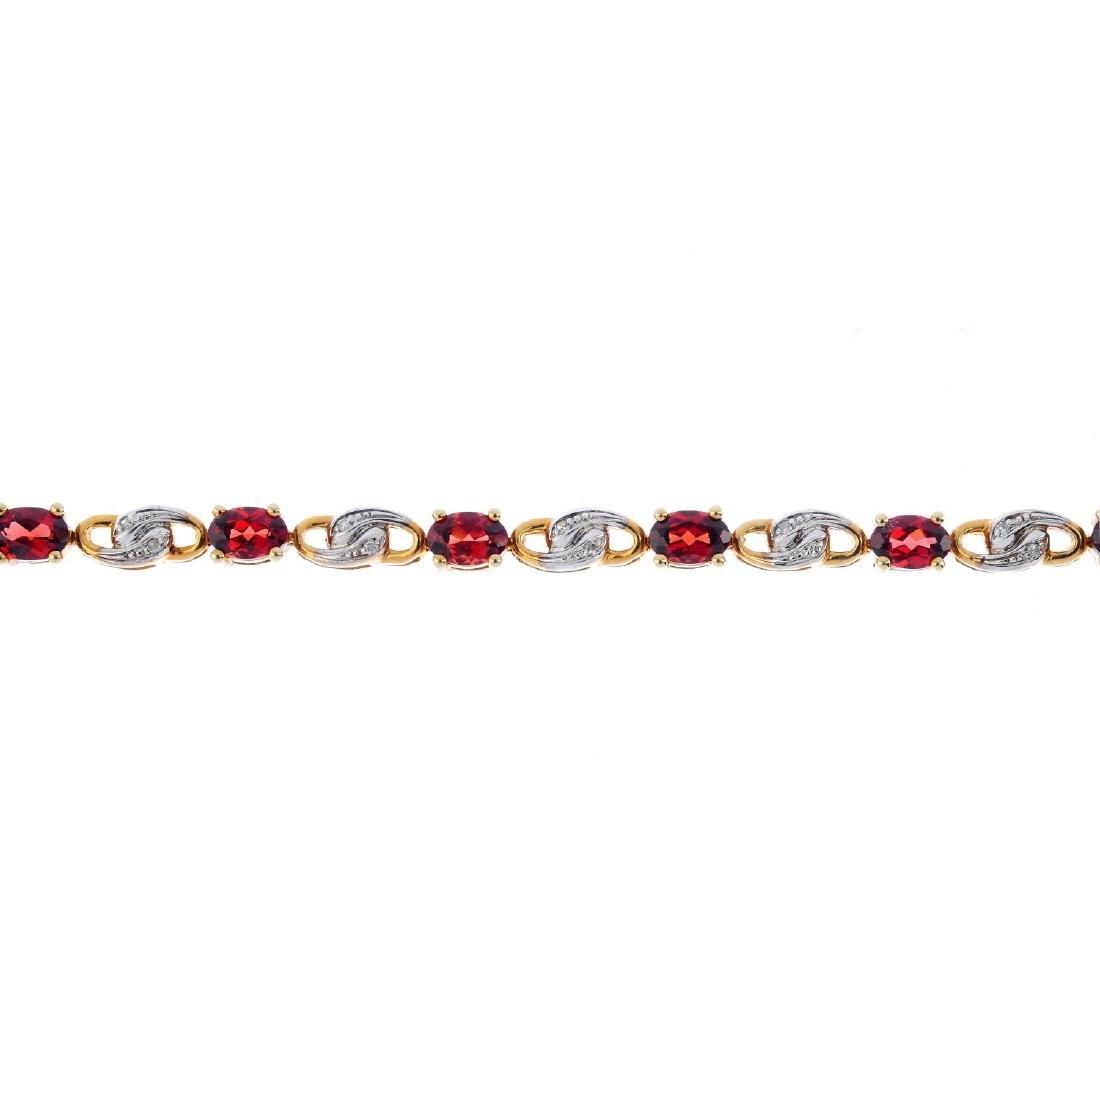 A 9ct gold garnet and diamond bracelet. Designed as a